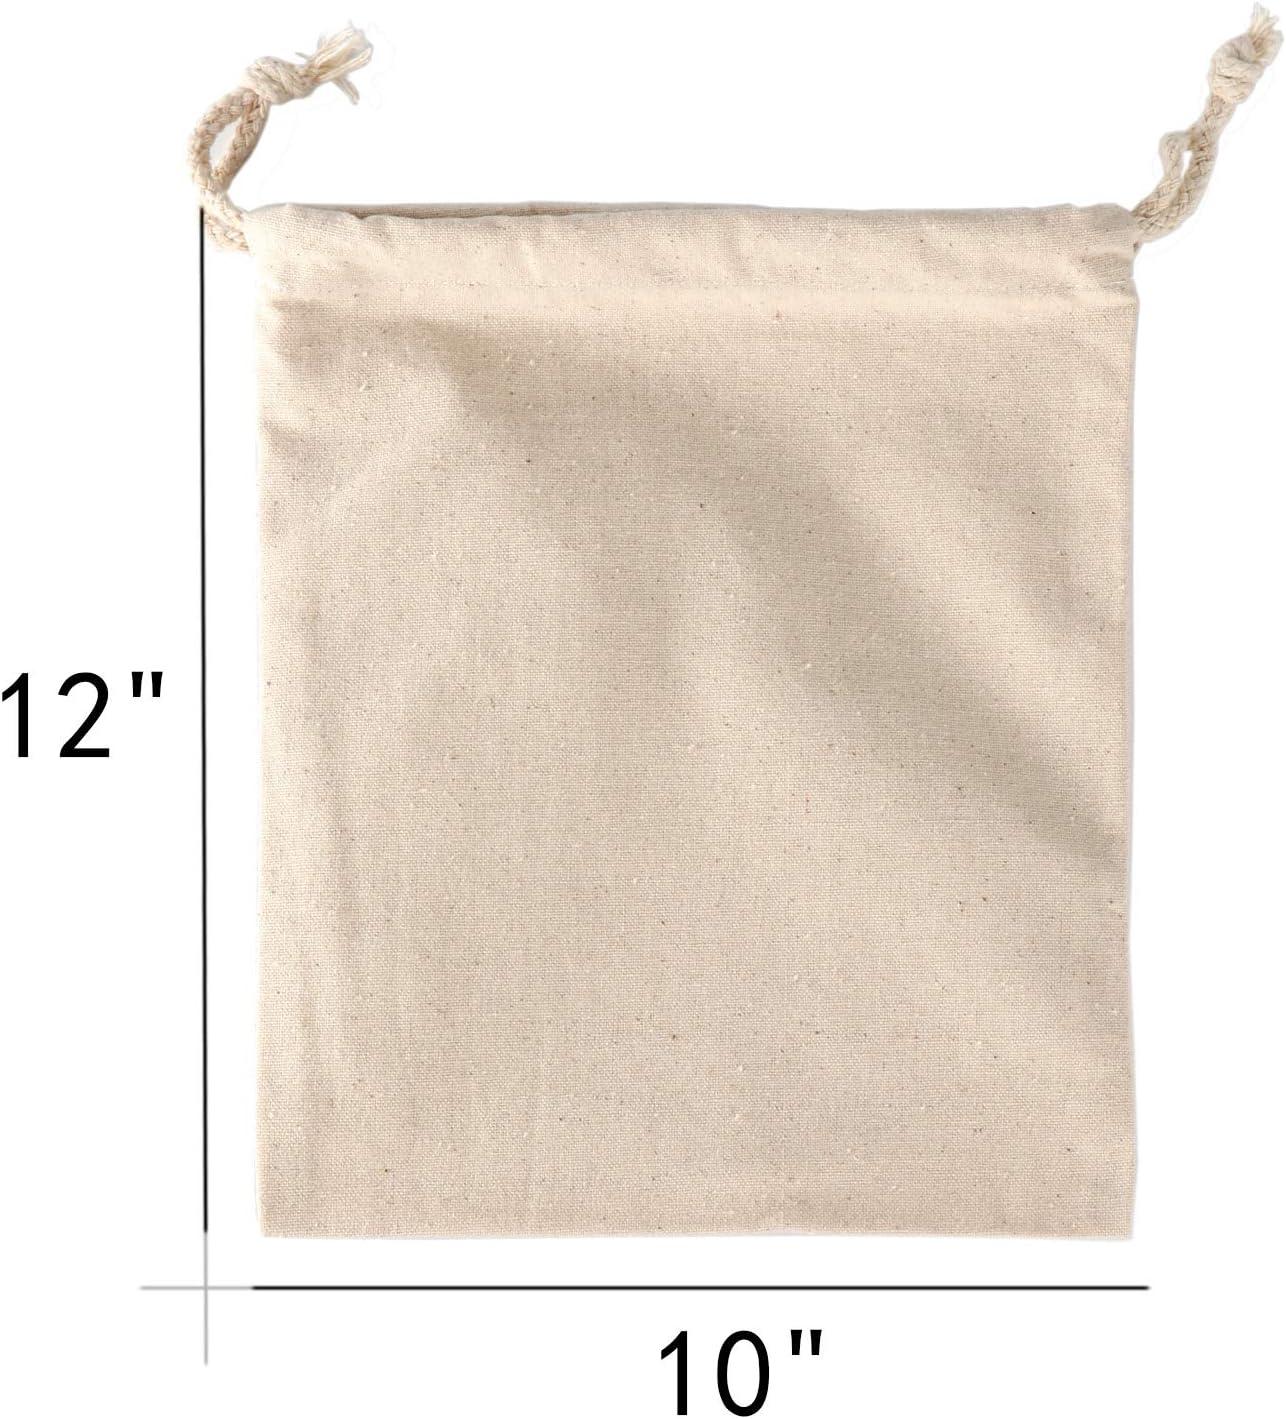 panes regalos de fiesta 12 paquetes de bolsas de almacenamiento reutilizables de algod/ón de muselina ecol/ógicas con cord/ón para verduras fritas 20x25cm